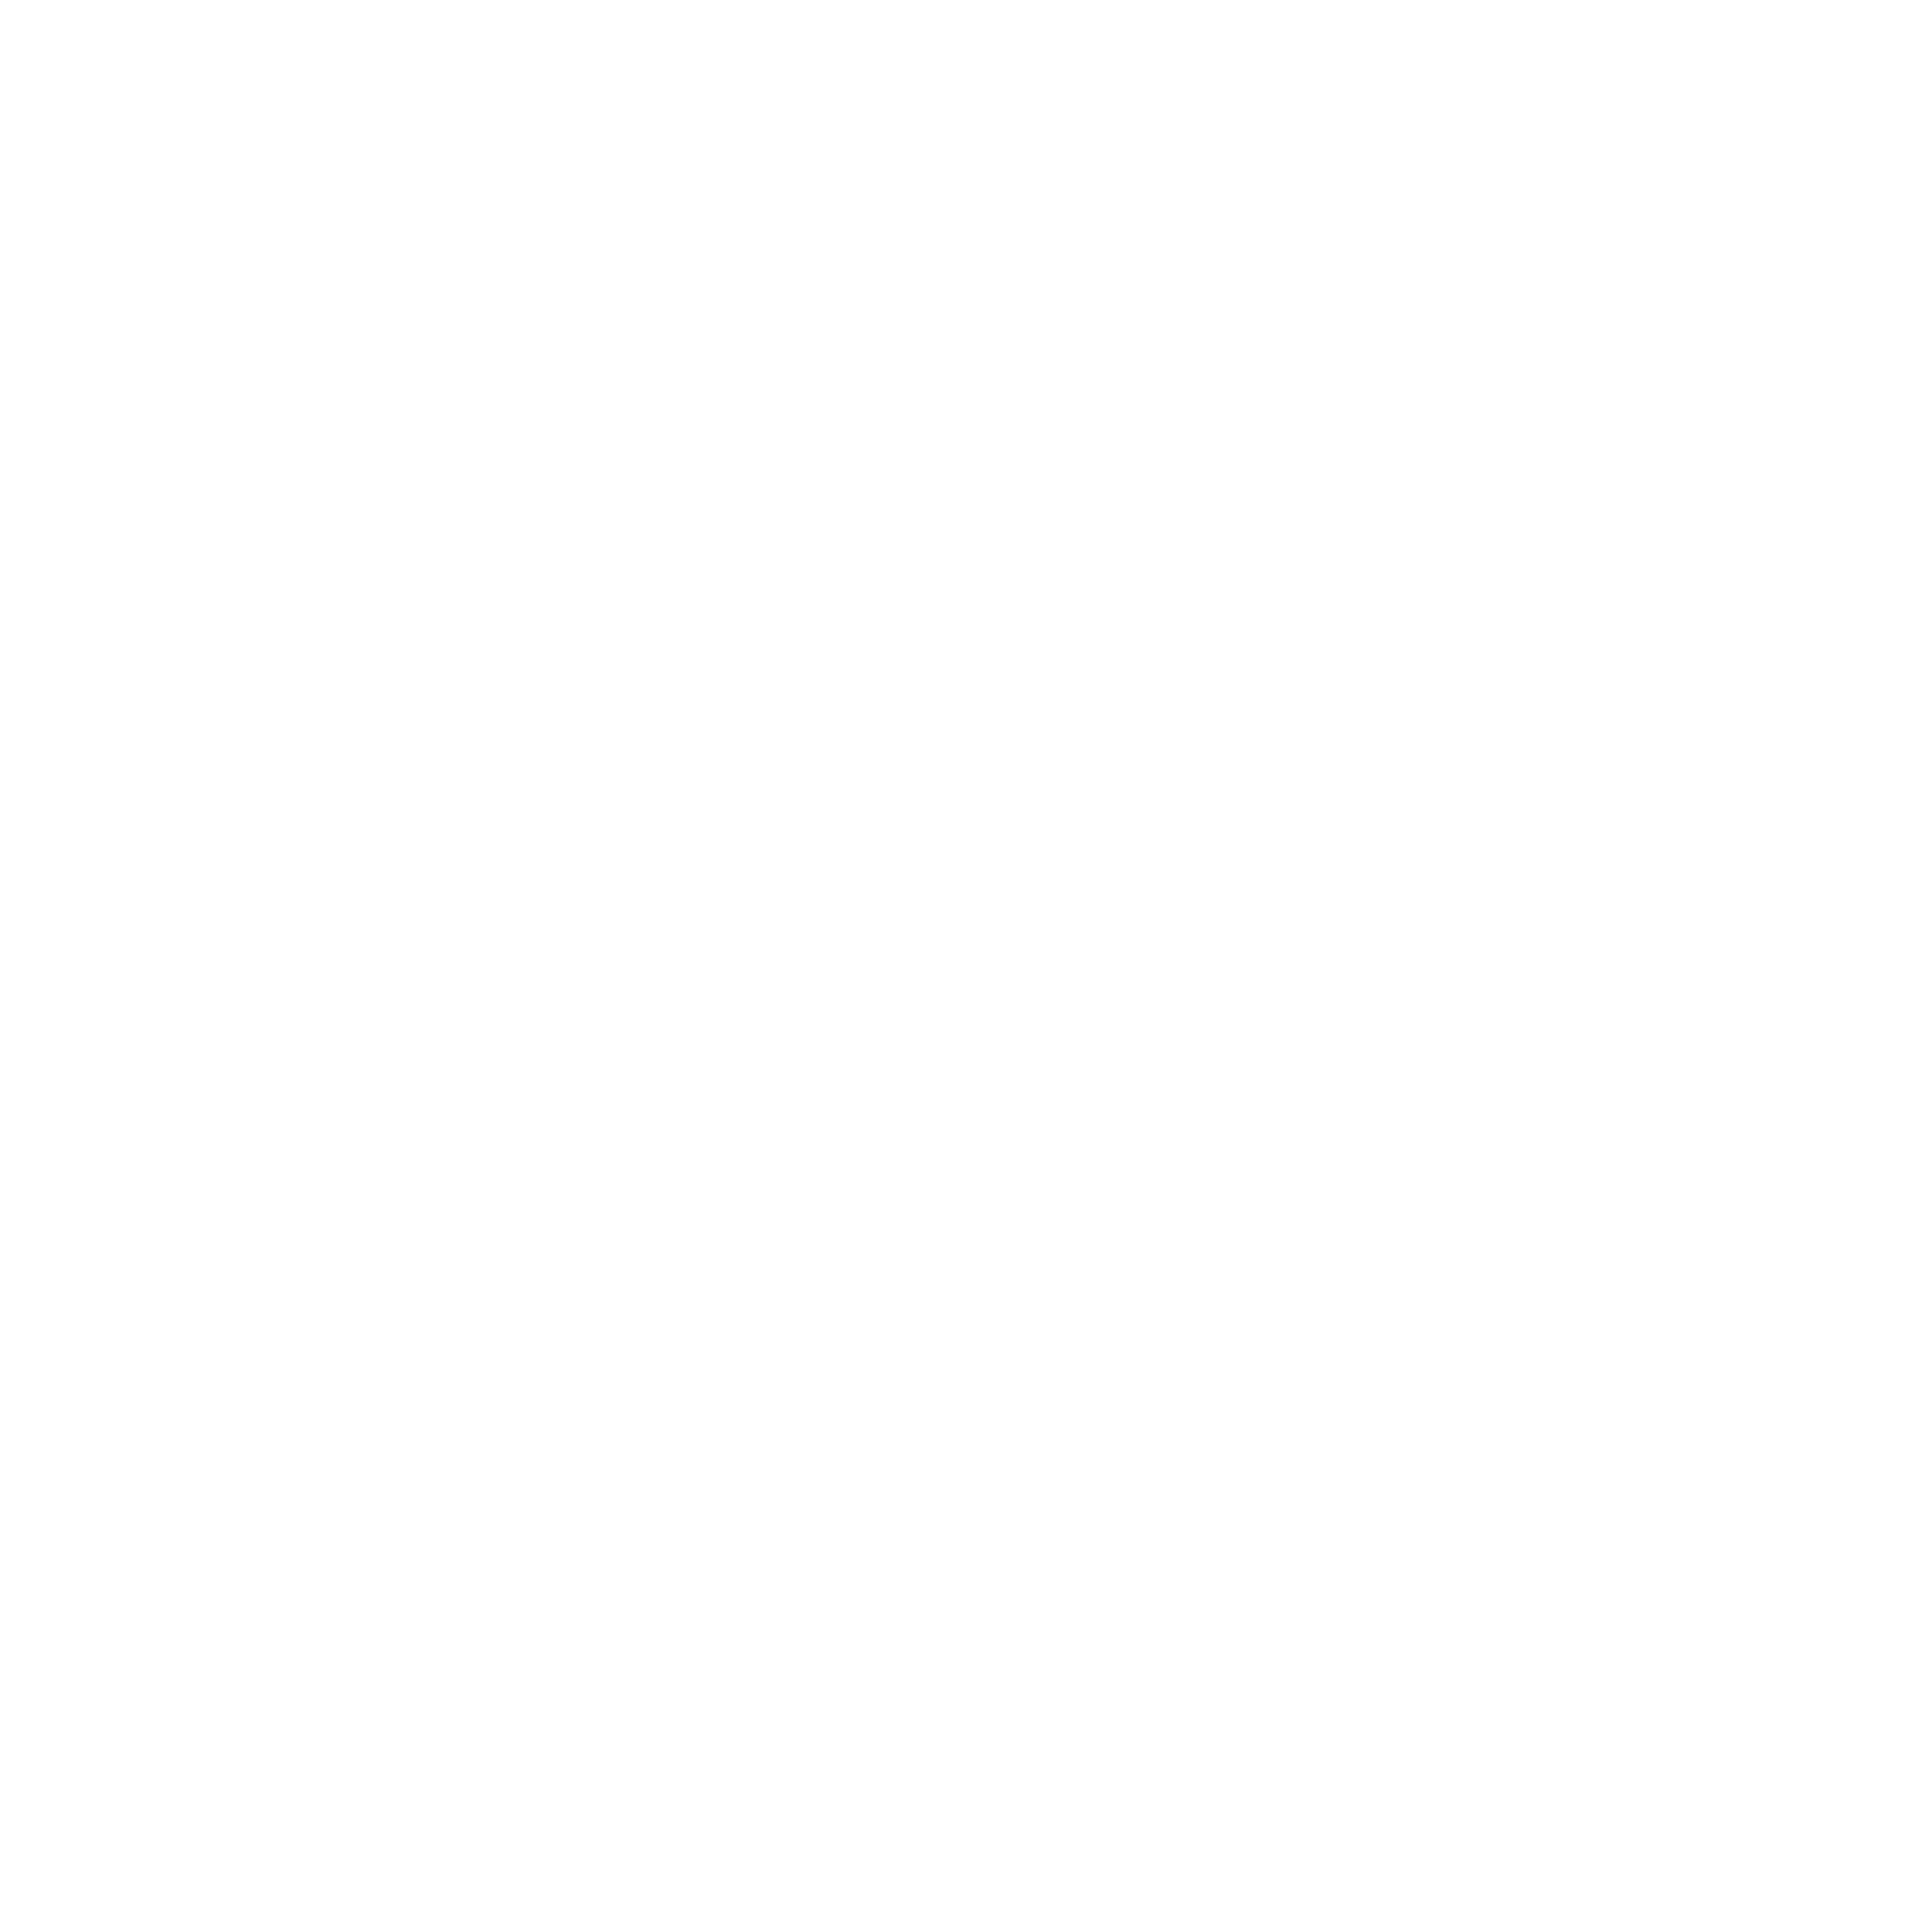 001-c